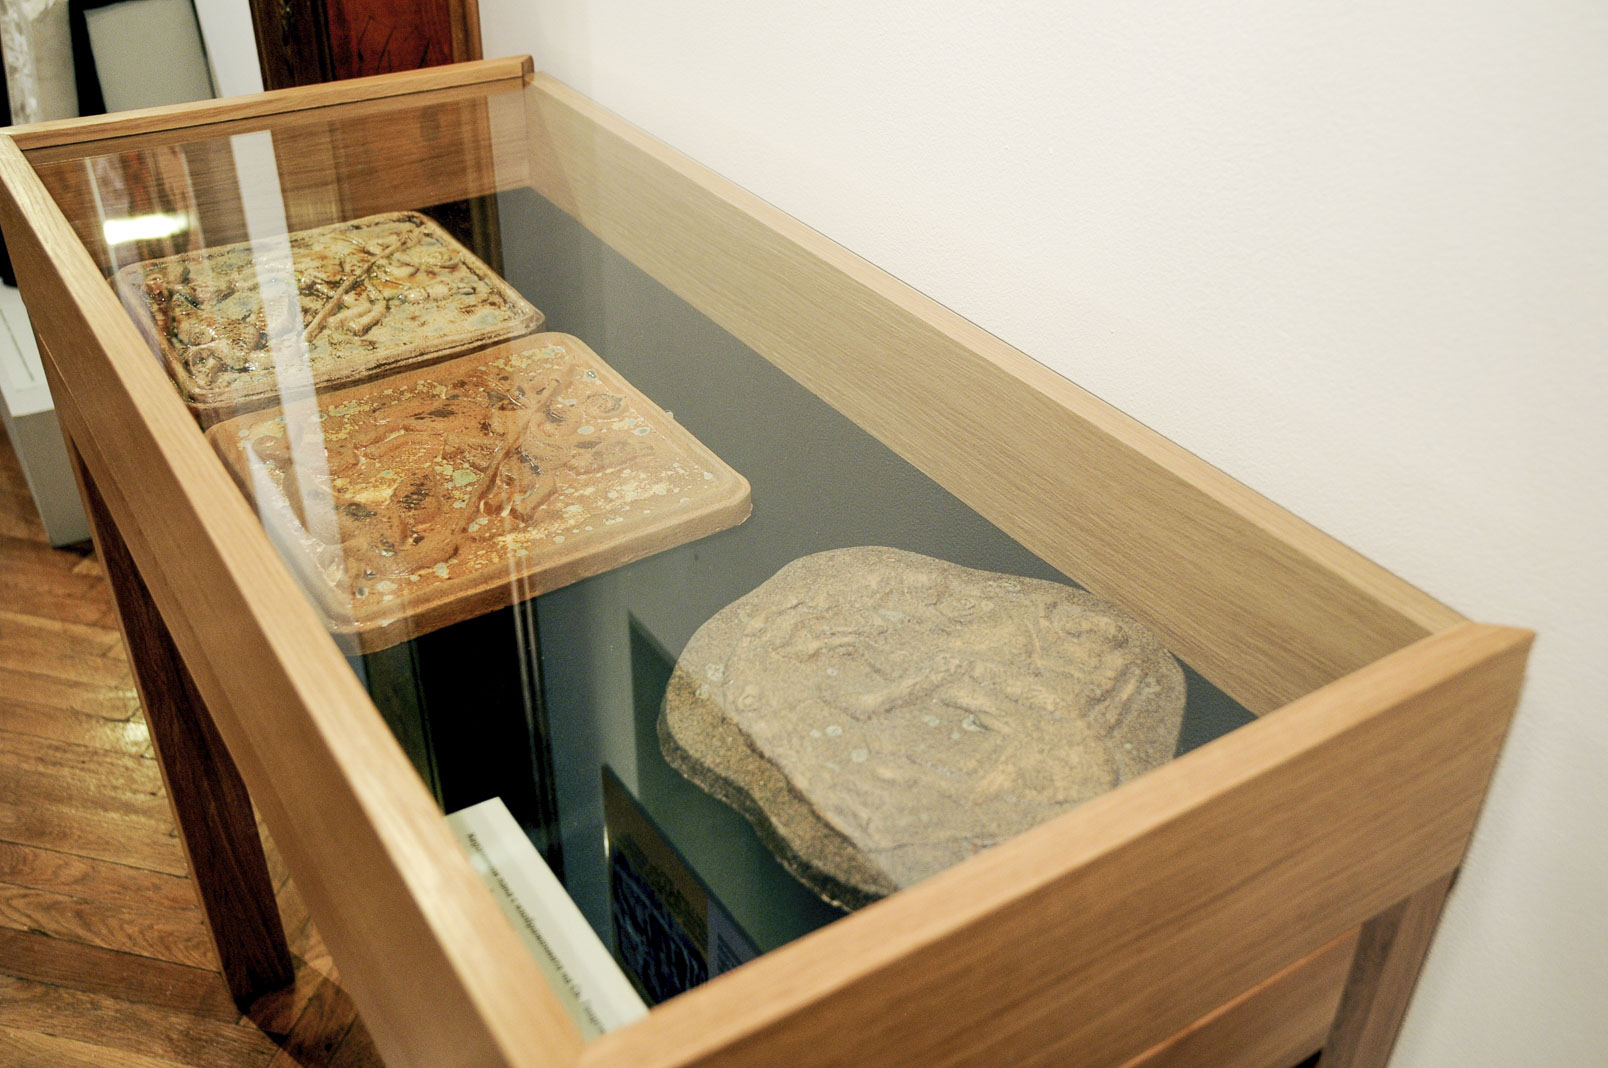 troyan-museum-jivotat-na-edna-idea-18